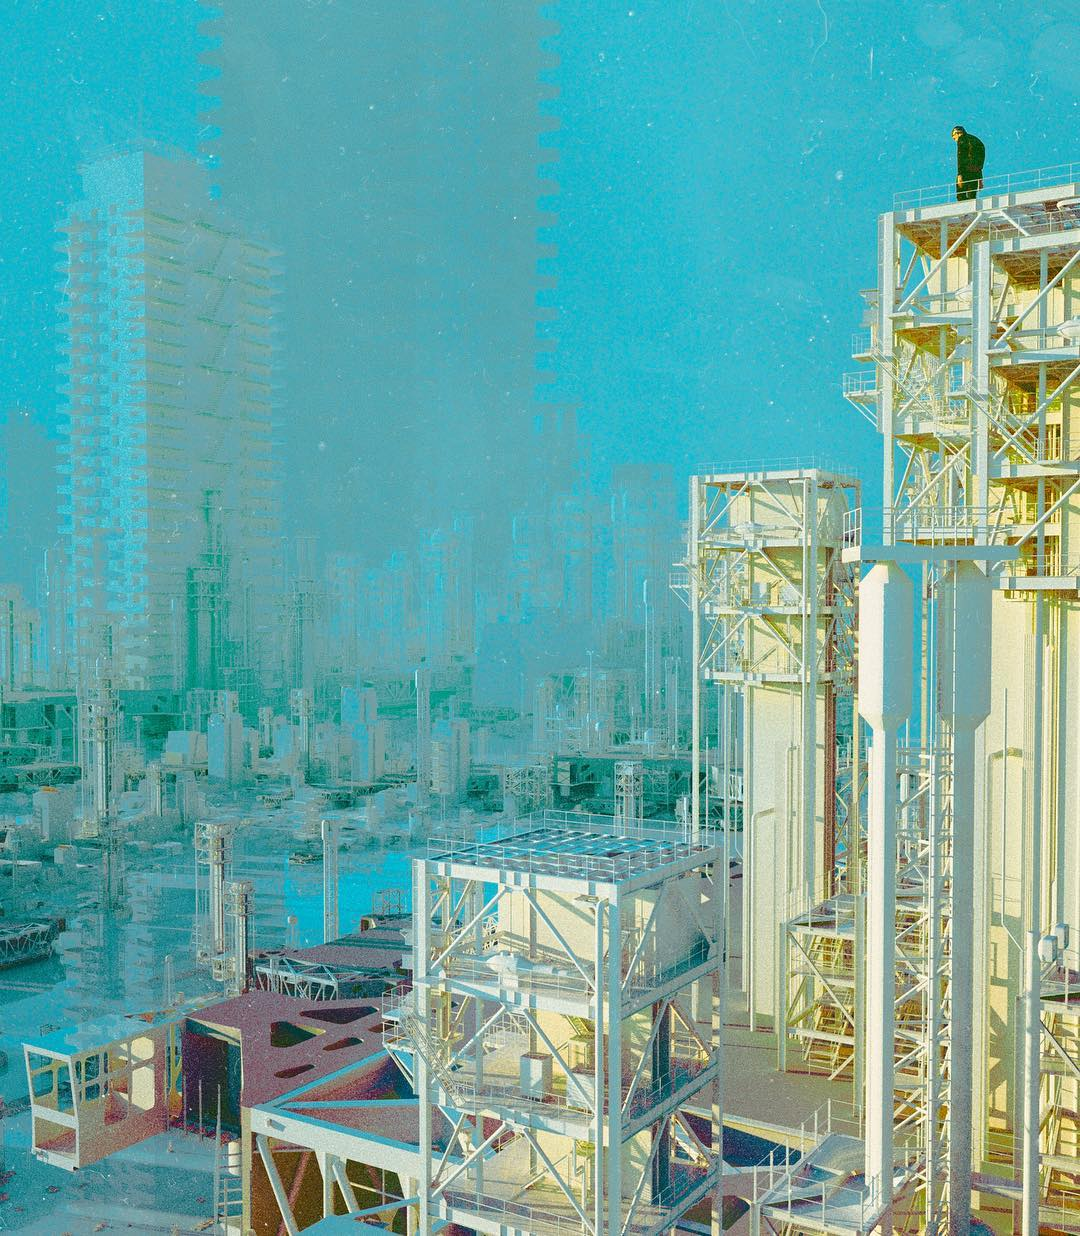 L'art digital 3D de Mike Winkelmann aka Beeple - MAJ Edition